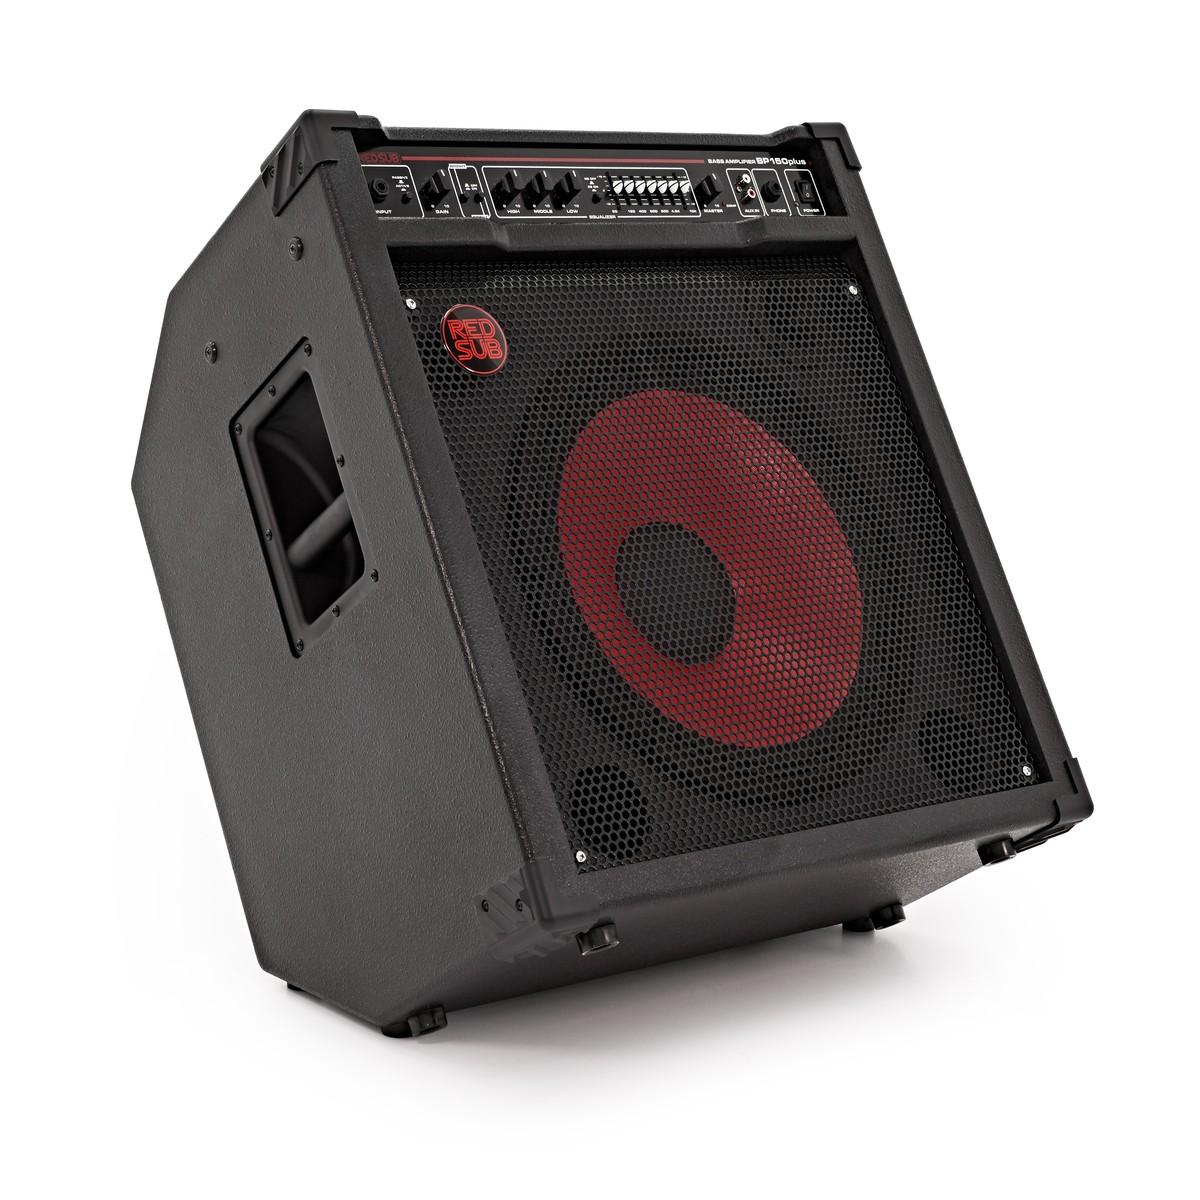 Bass Guitar To Amp : redsub bp150plus 150w bass guitar amplifier at ~ Hamham.info Haus und Dekorationen